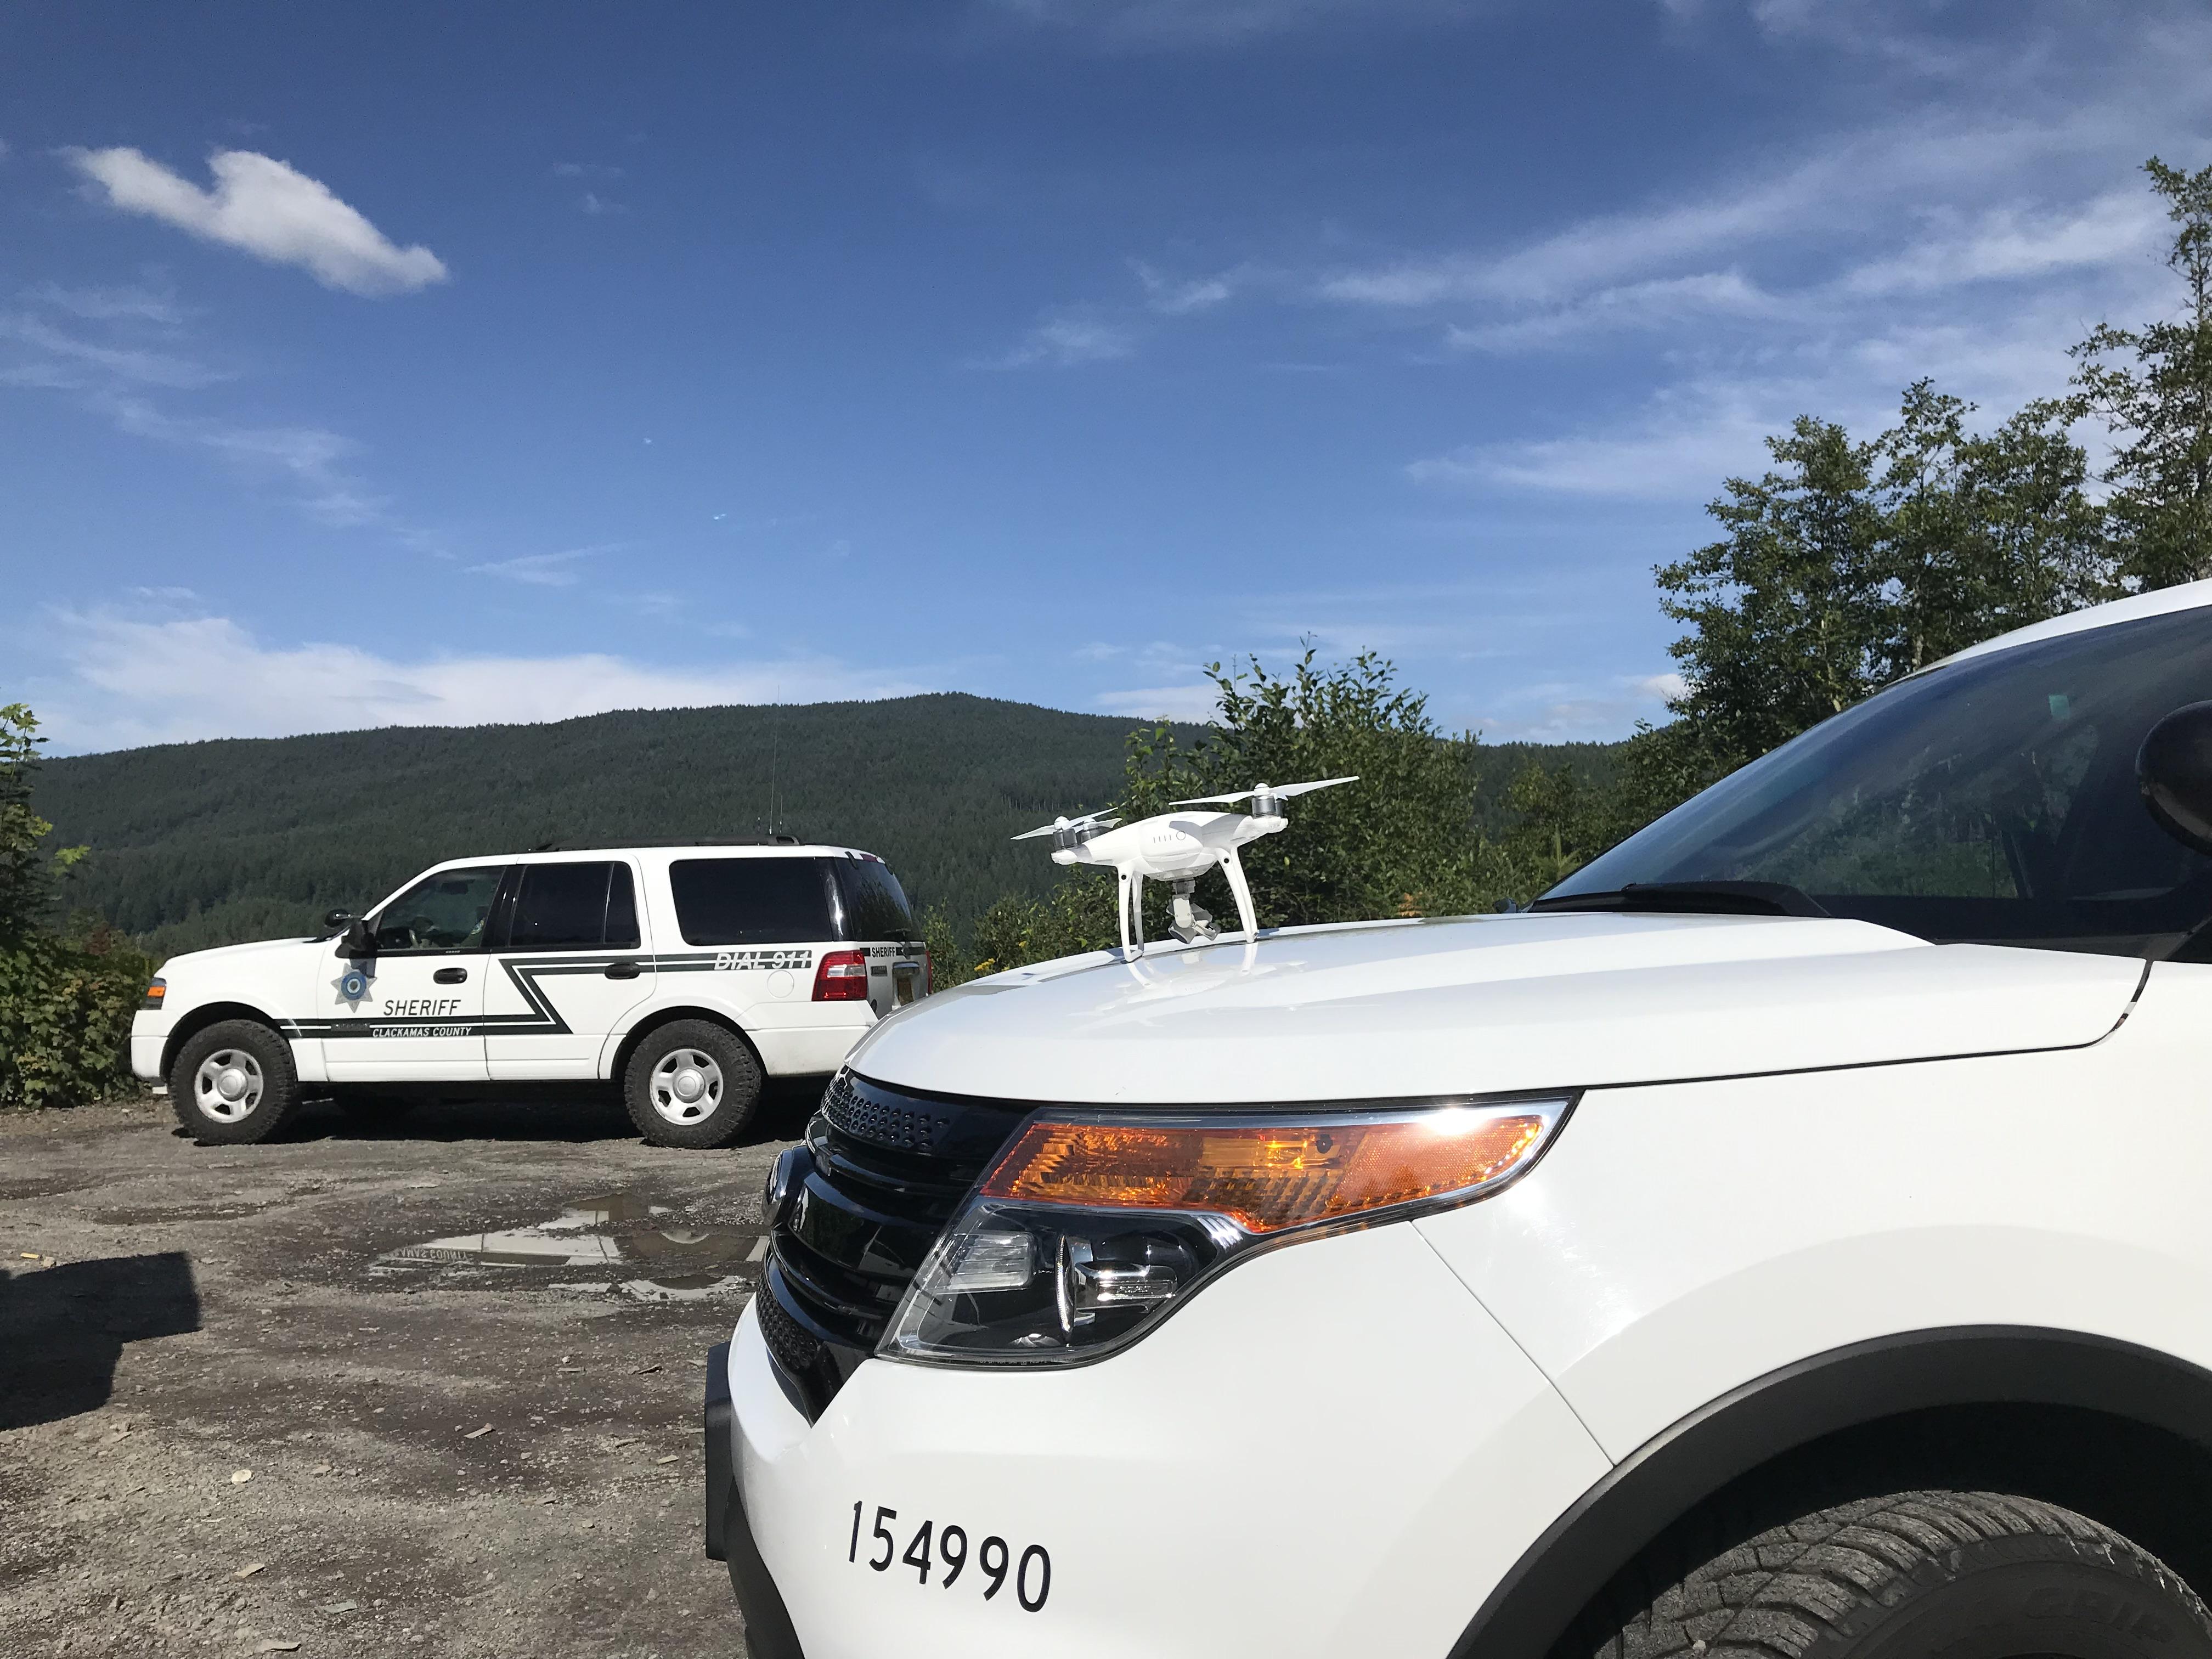 Patrol vehicles at scene